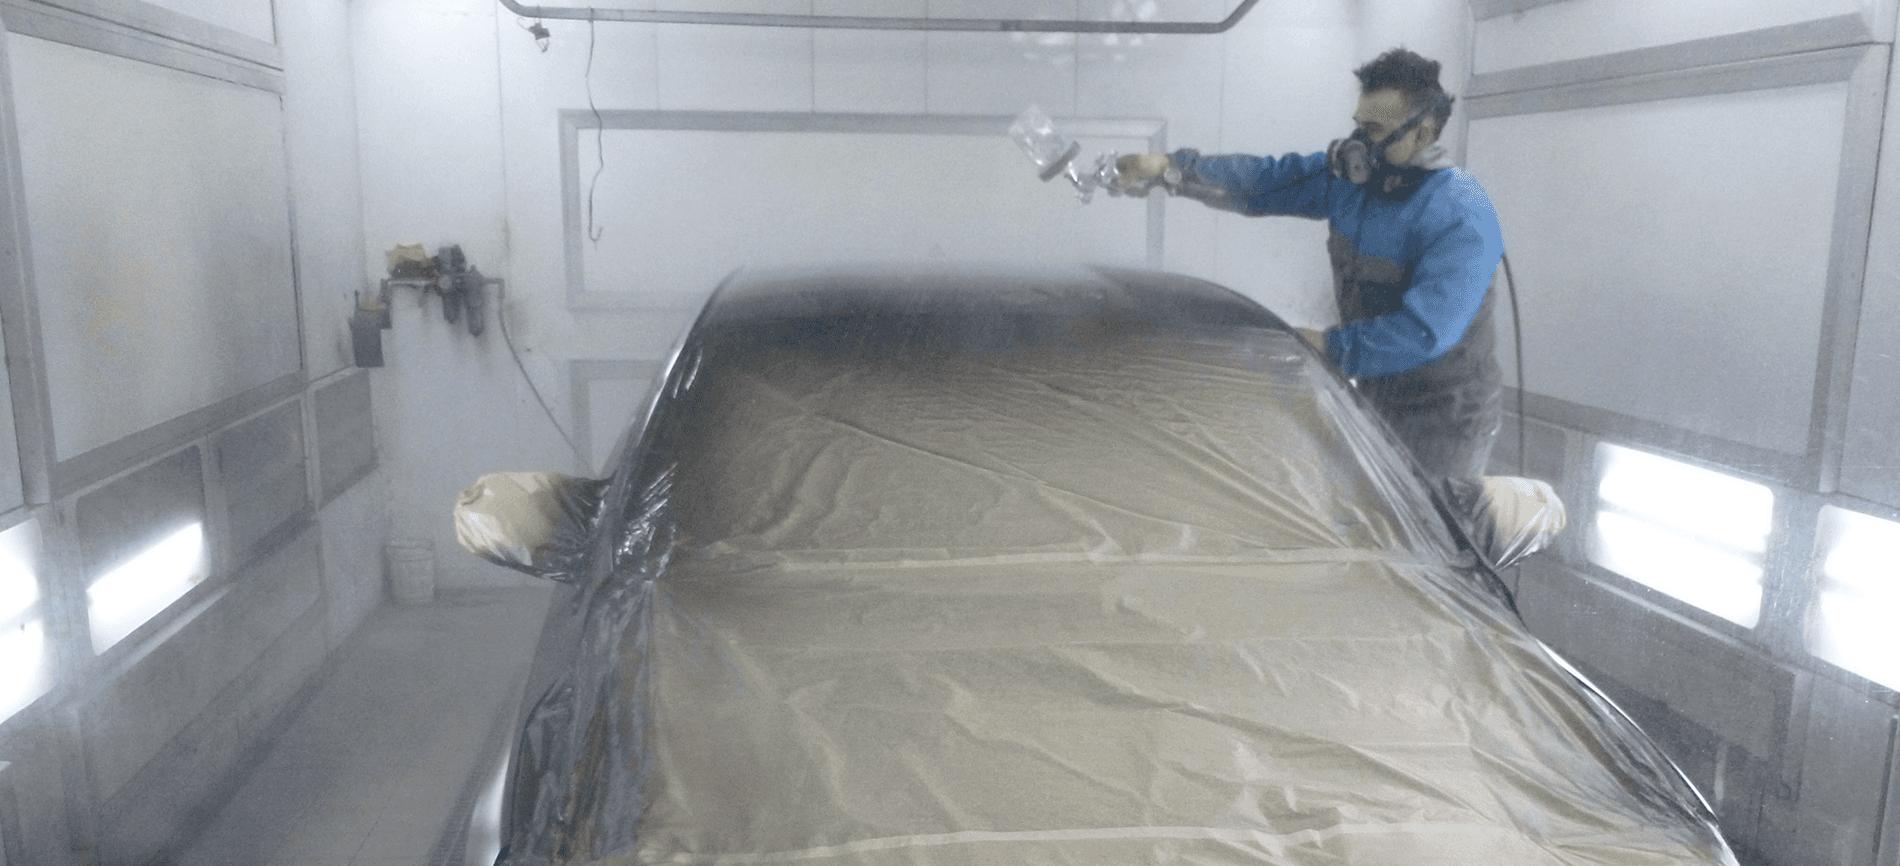 carrozziere che pittura macchina